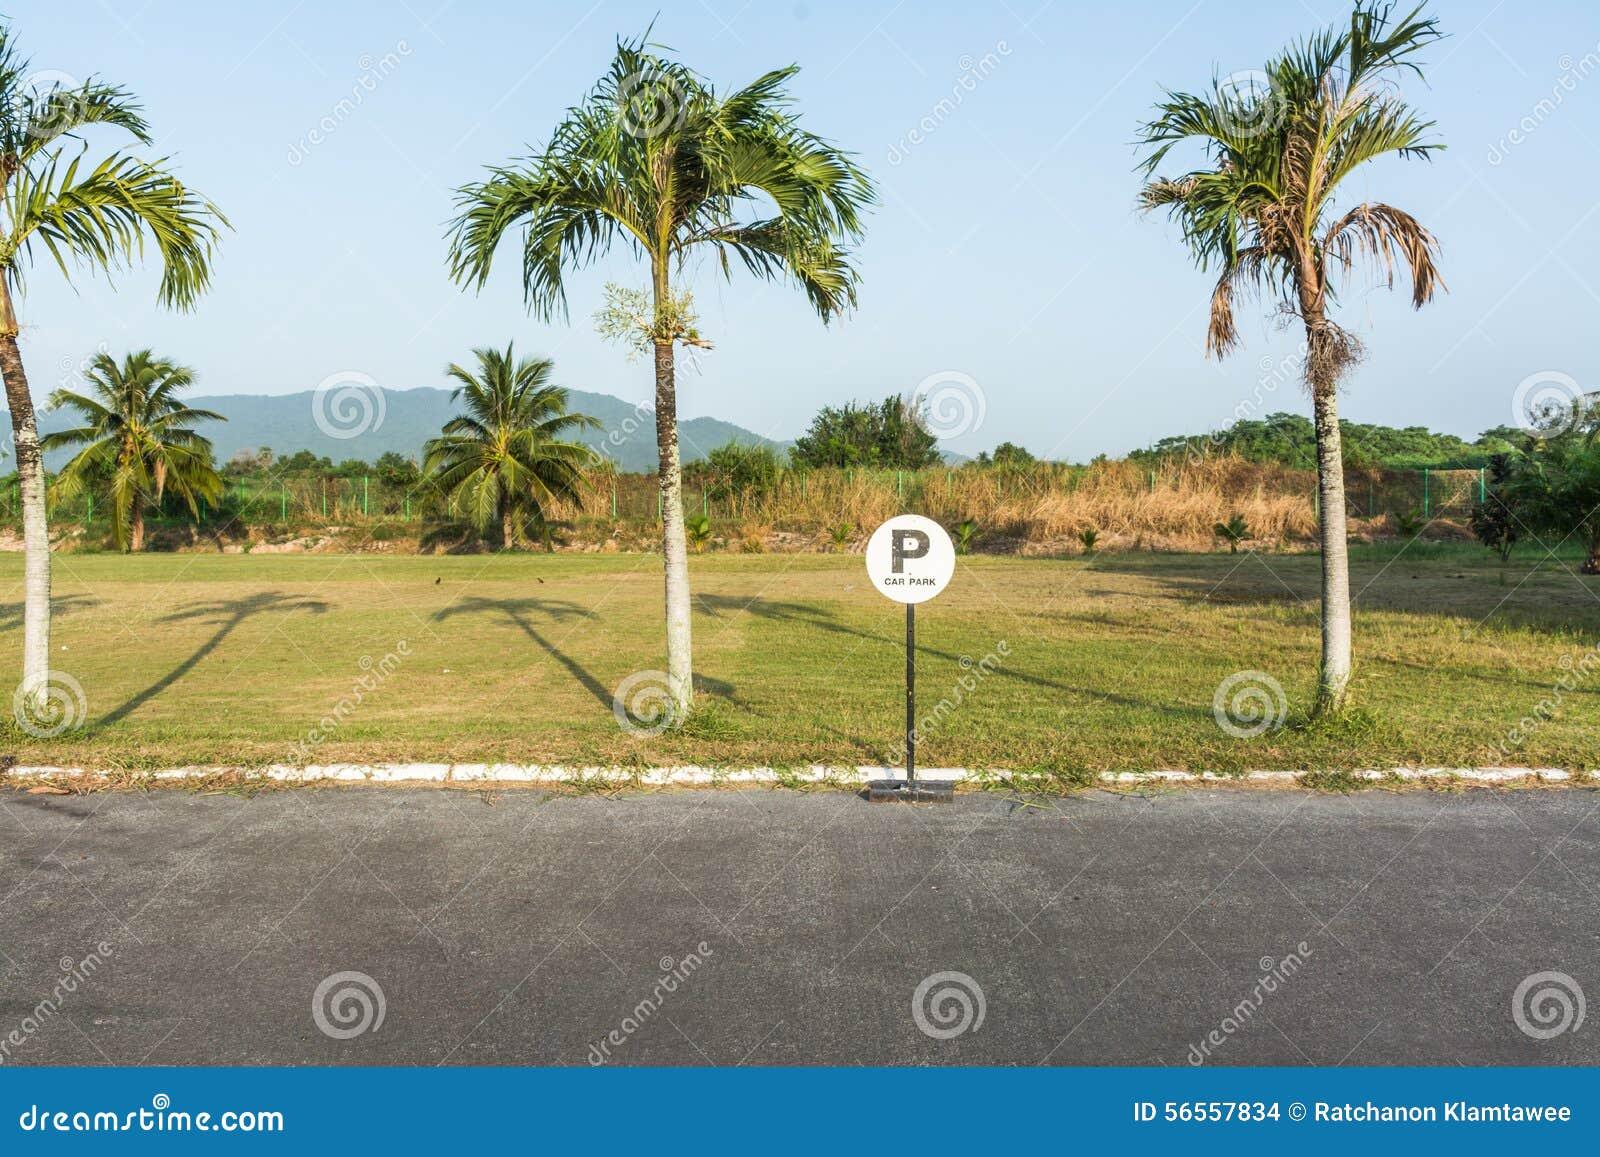 Download Υπαίθριος σταθμός αυτοκινήτων Στοκ Εικόνες - εικόνα από κενός, parking: 56557834